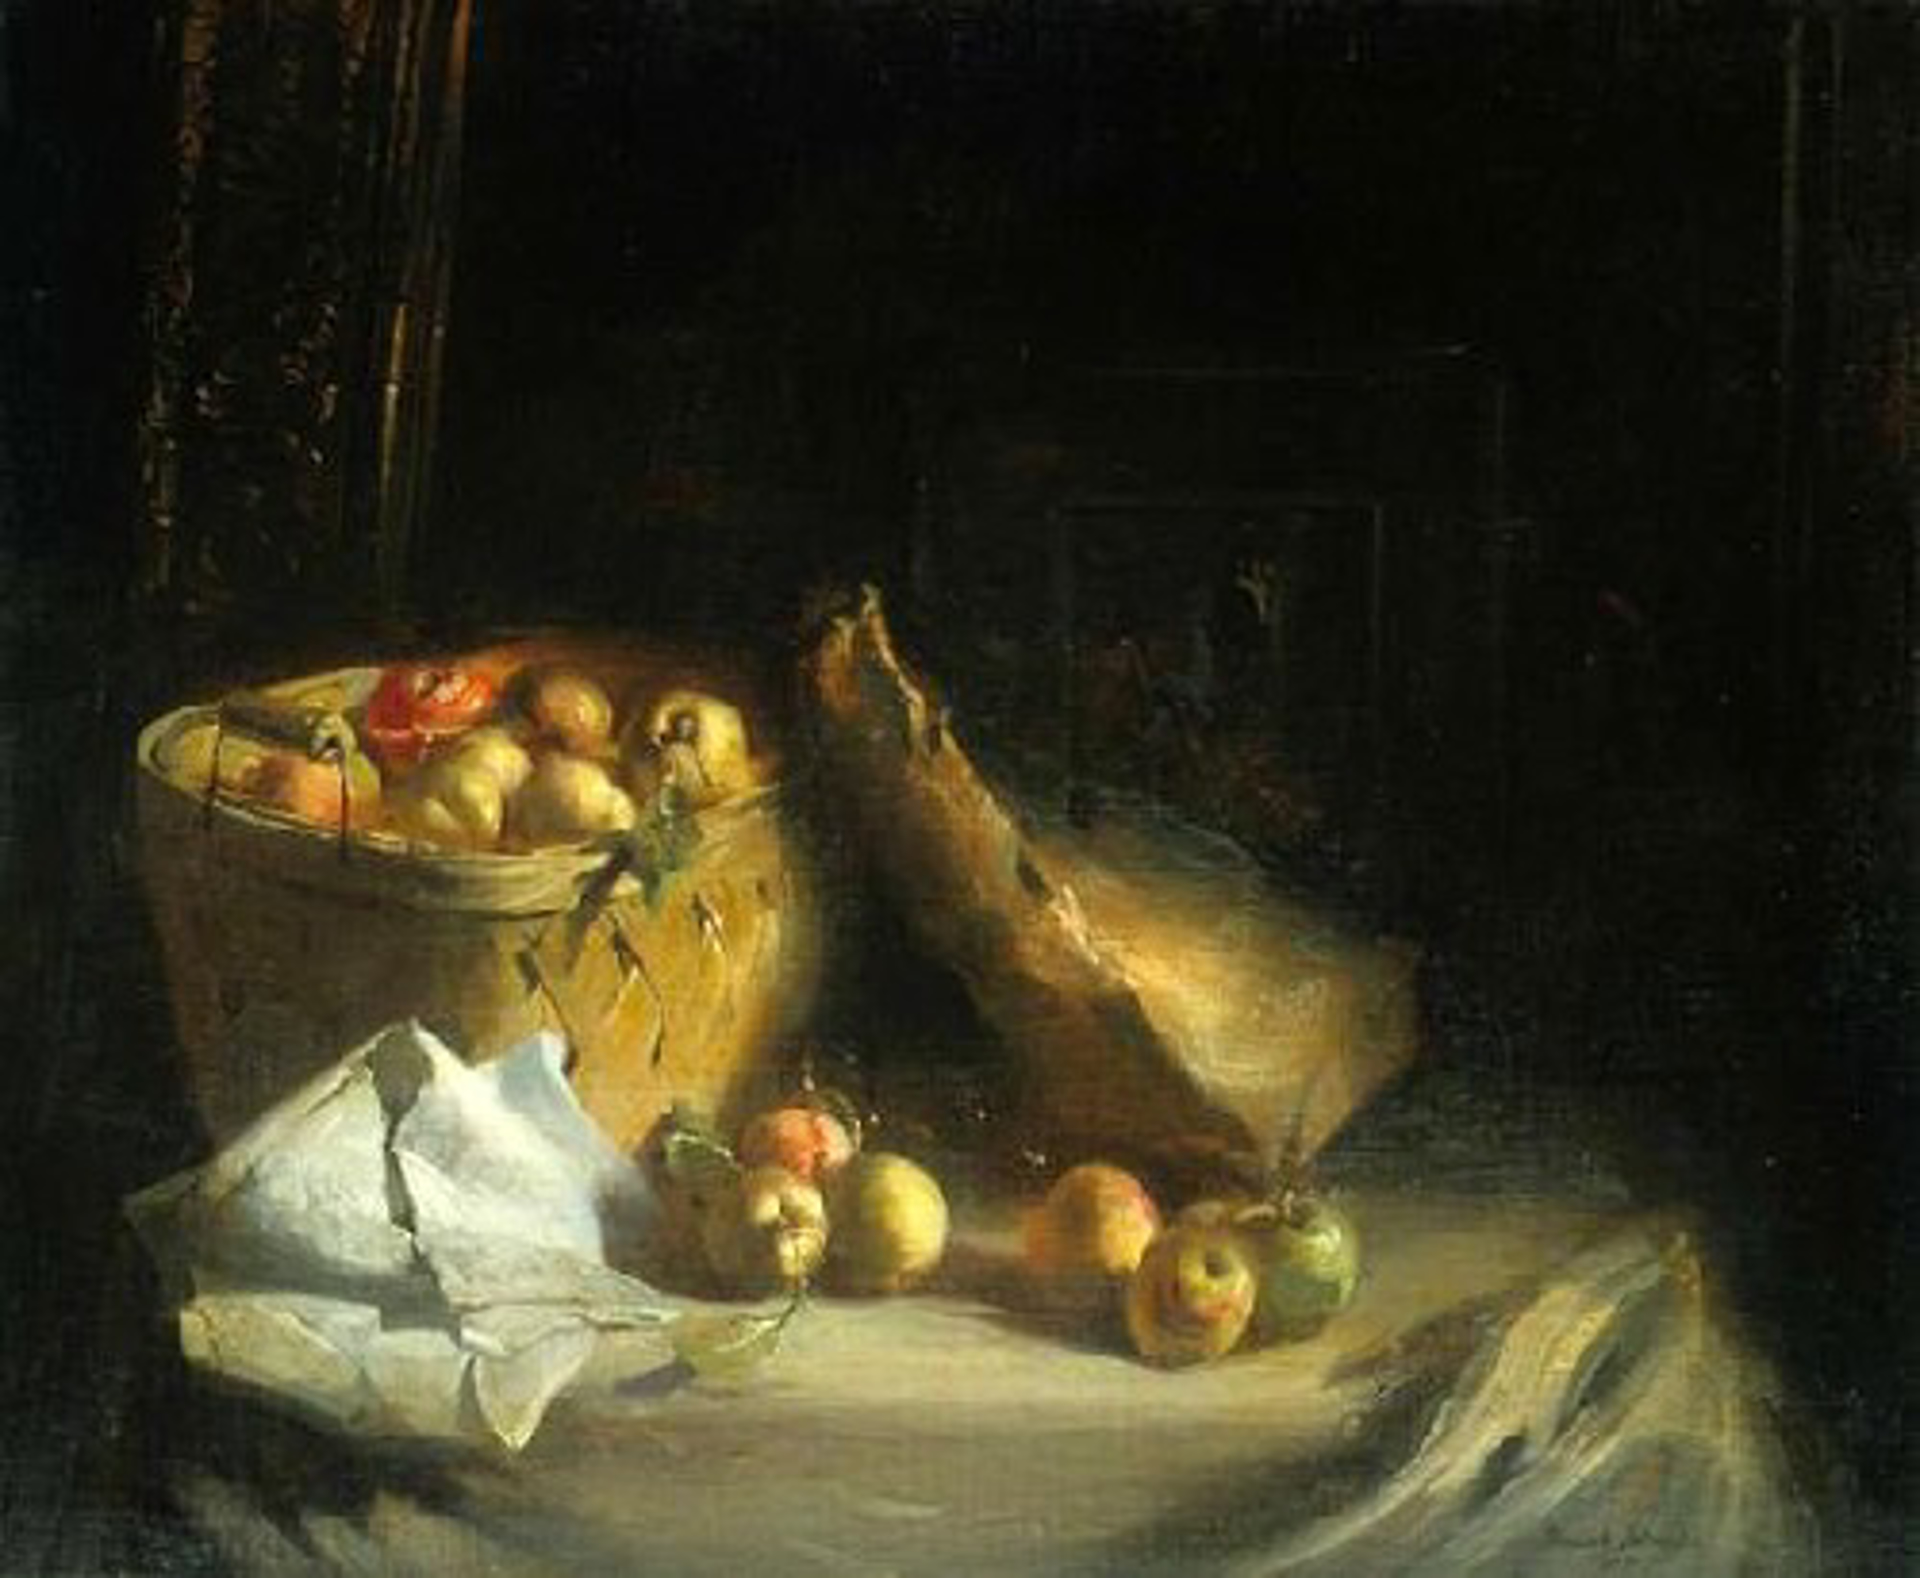 Apple Basket by Frank Mason (1921 - 2009)